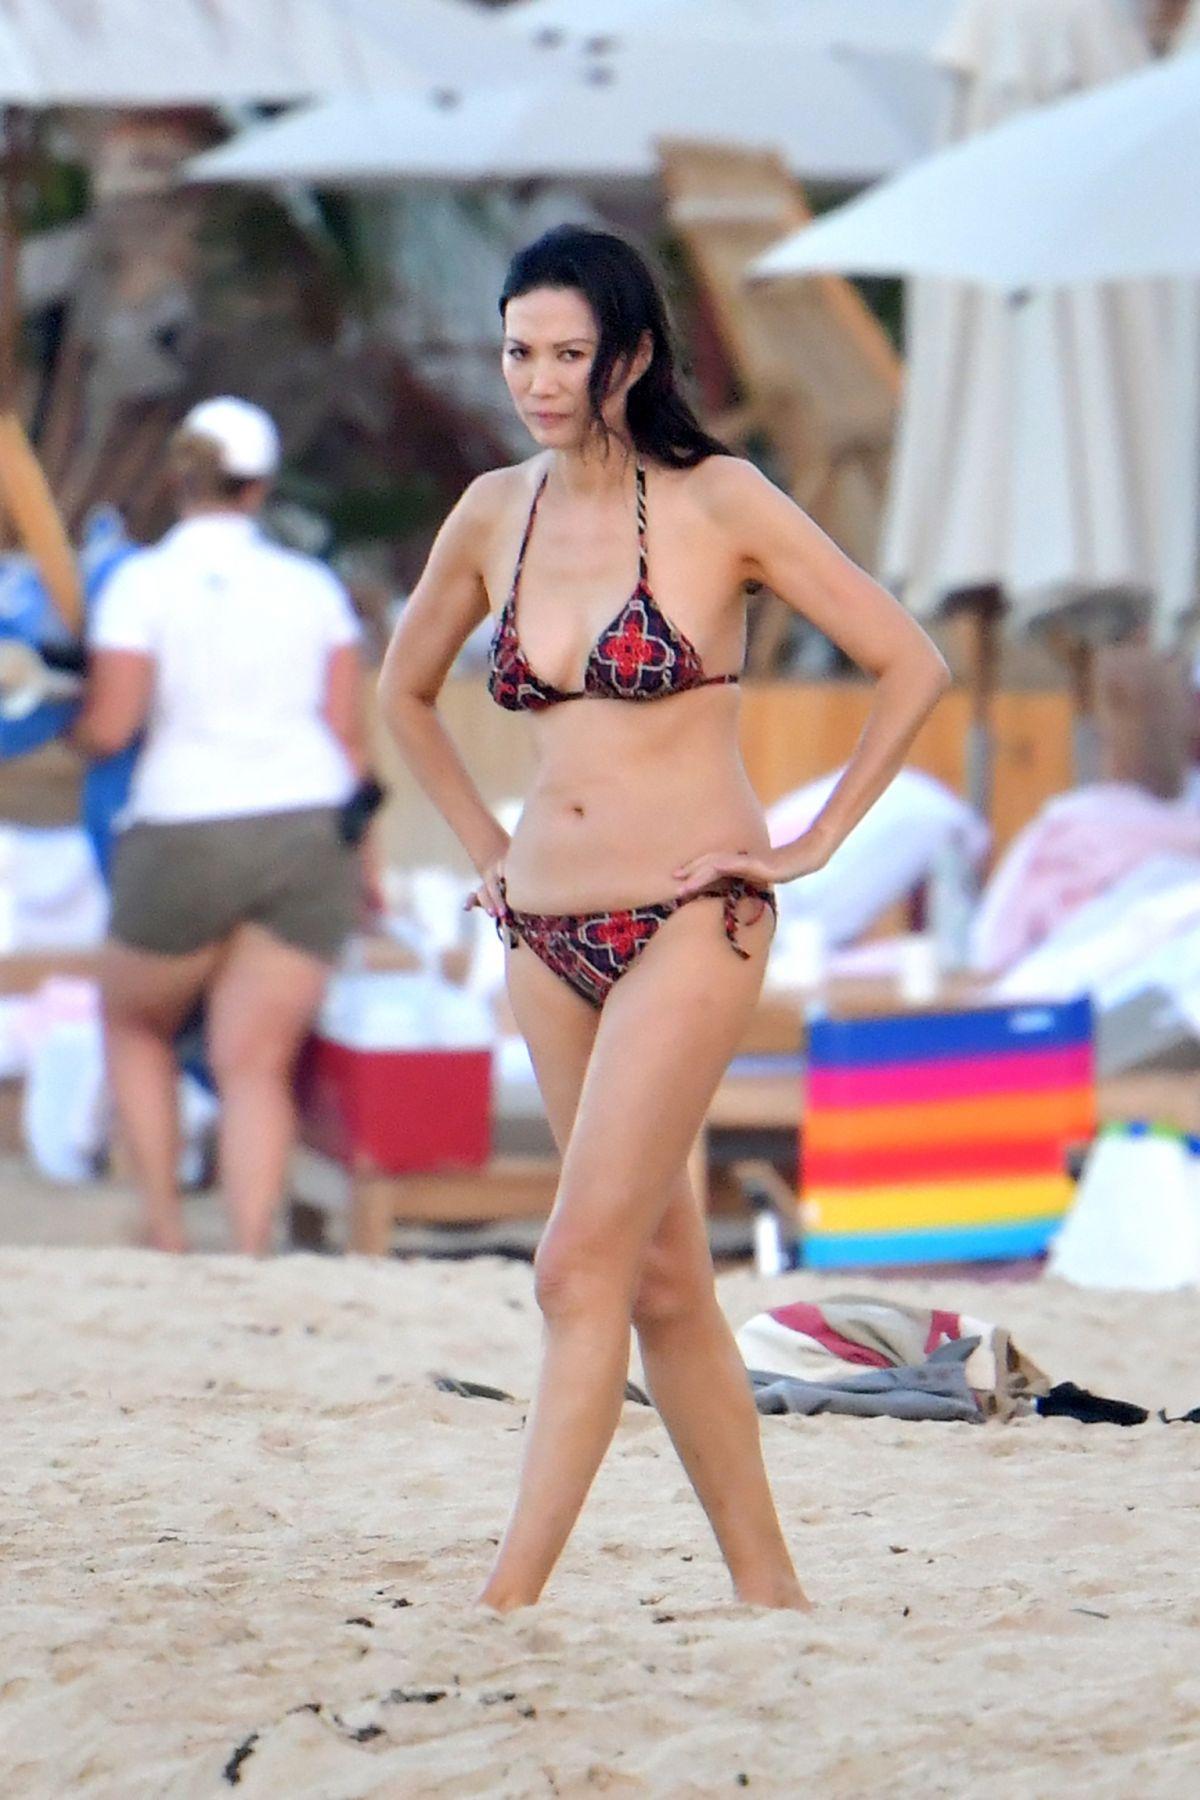 Wendi Deng Murdoch Bikini Nude Photos 10